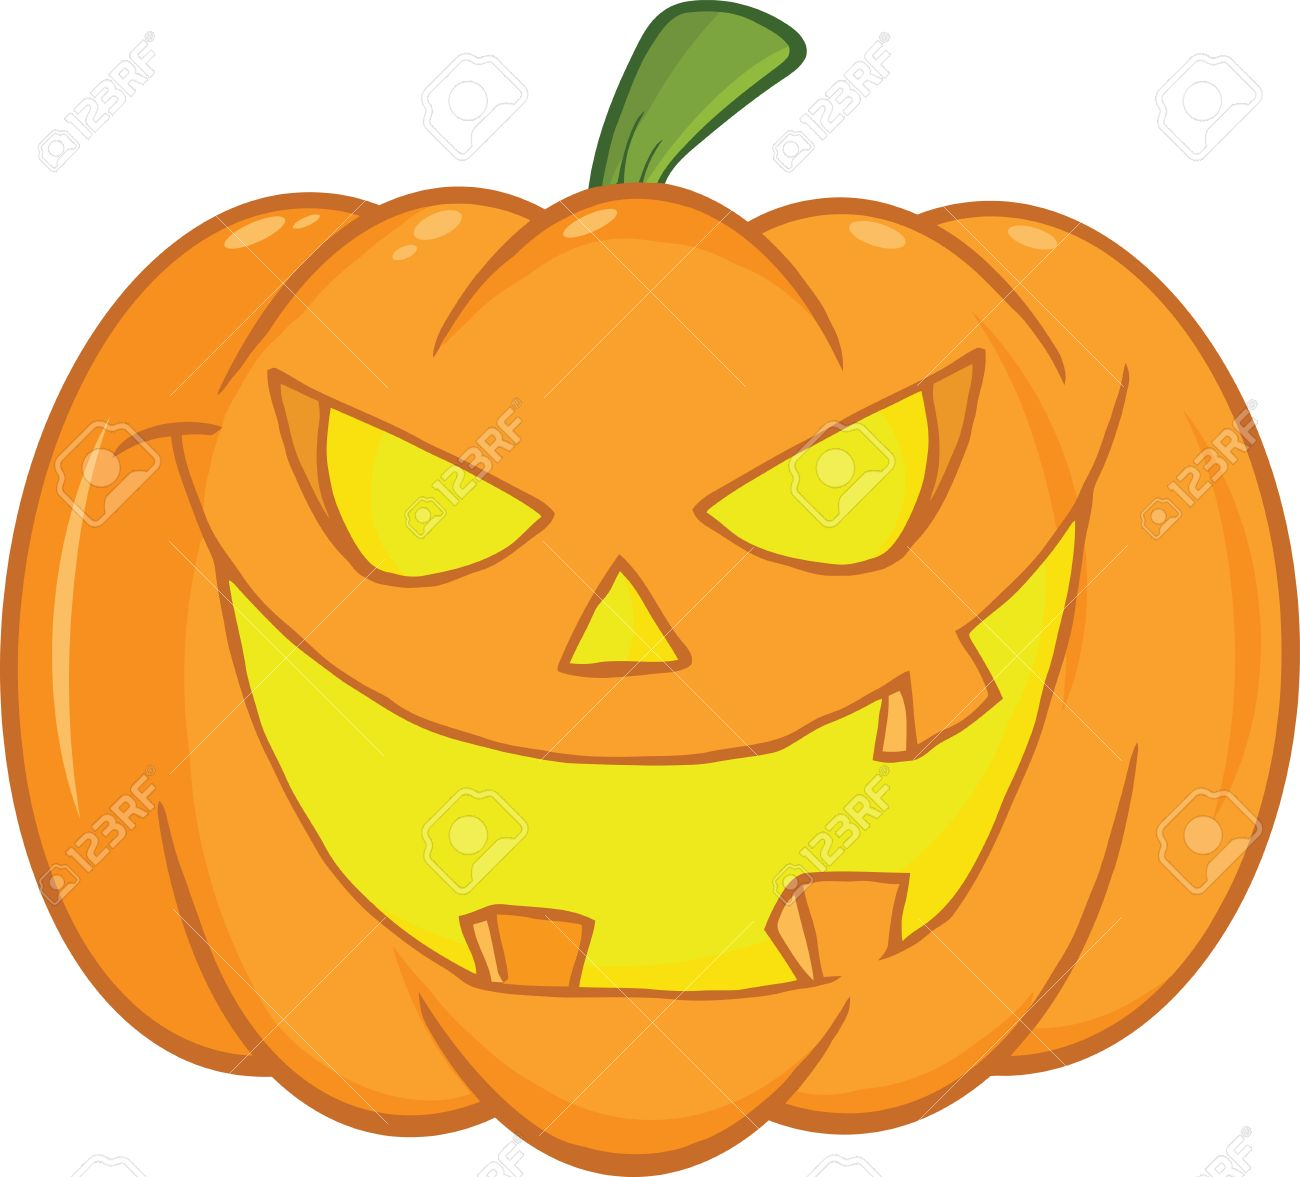 Halloween Pumpkin Cartoon Images.Scary Halloween Pumpkin Cartoon Illustration